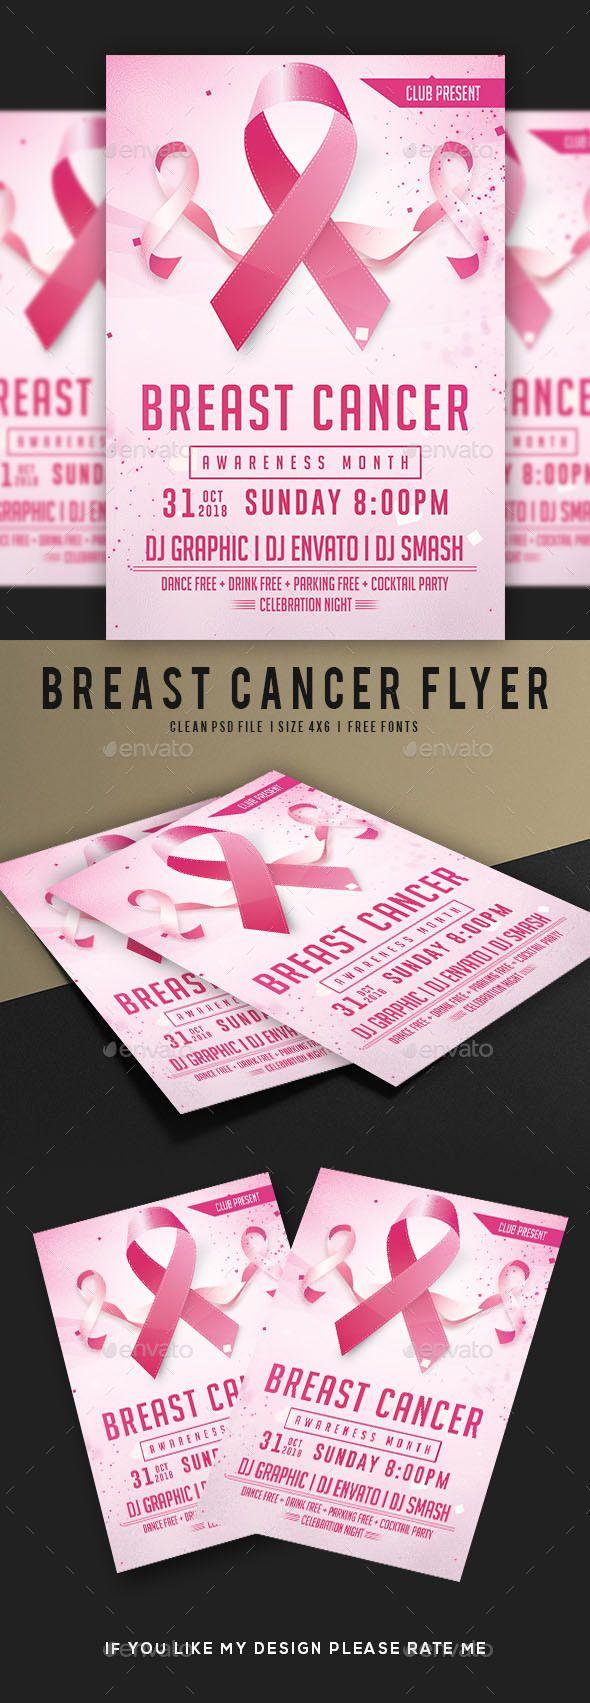 Breast Cancer Awareness Month Flyer   Pinterest   Breast cancer ...